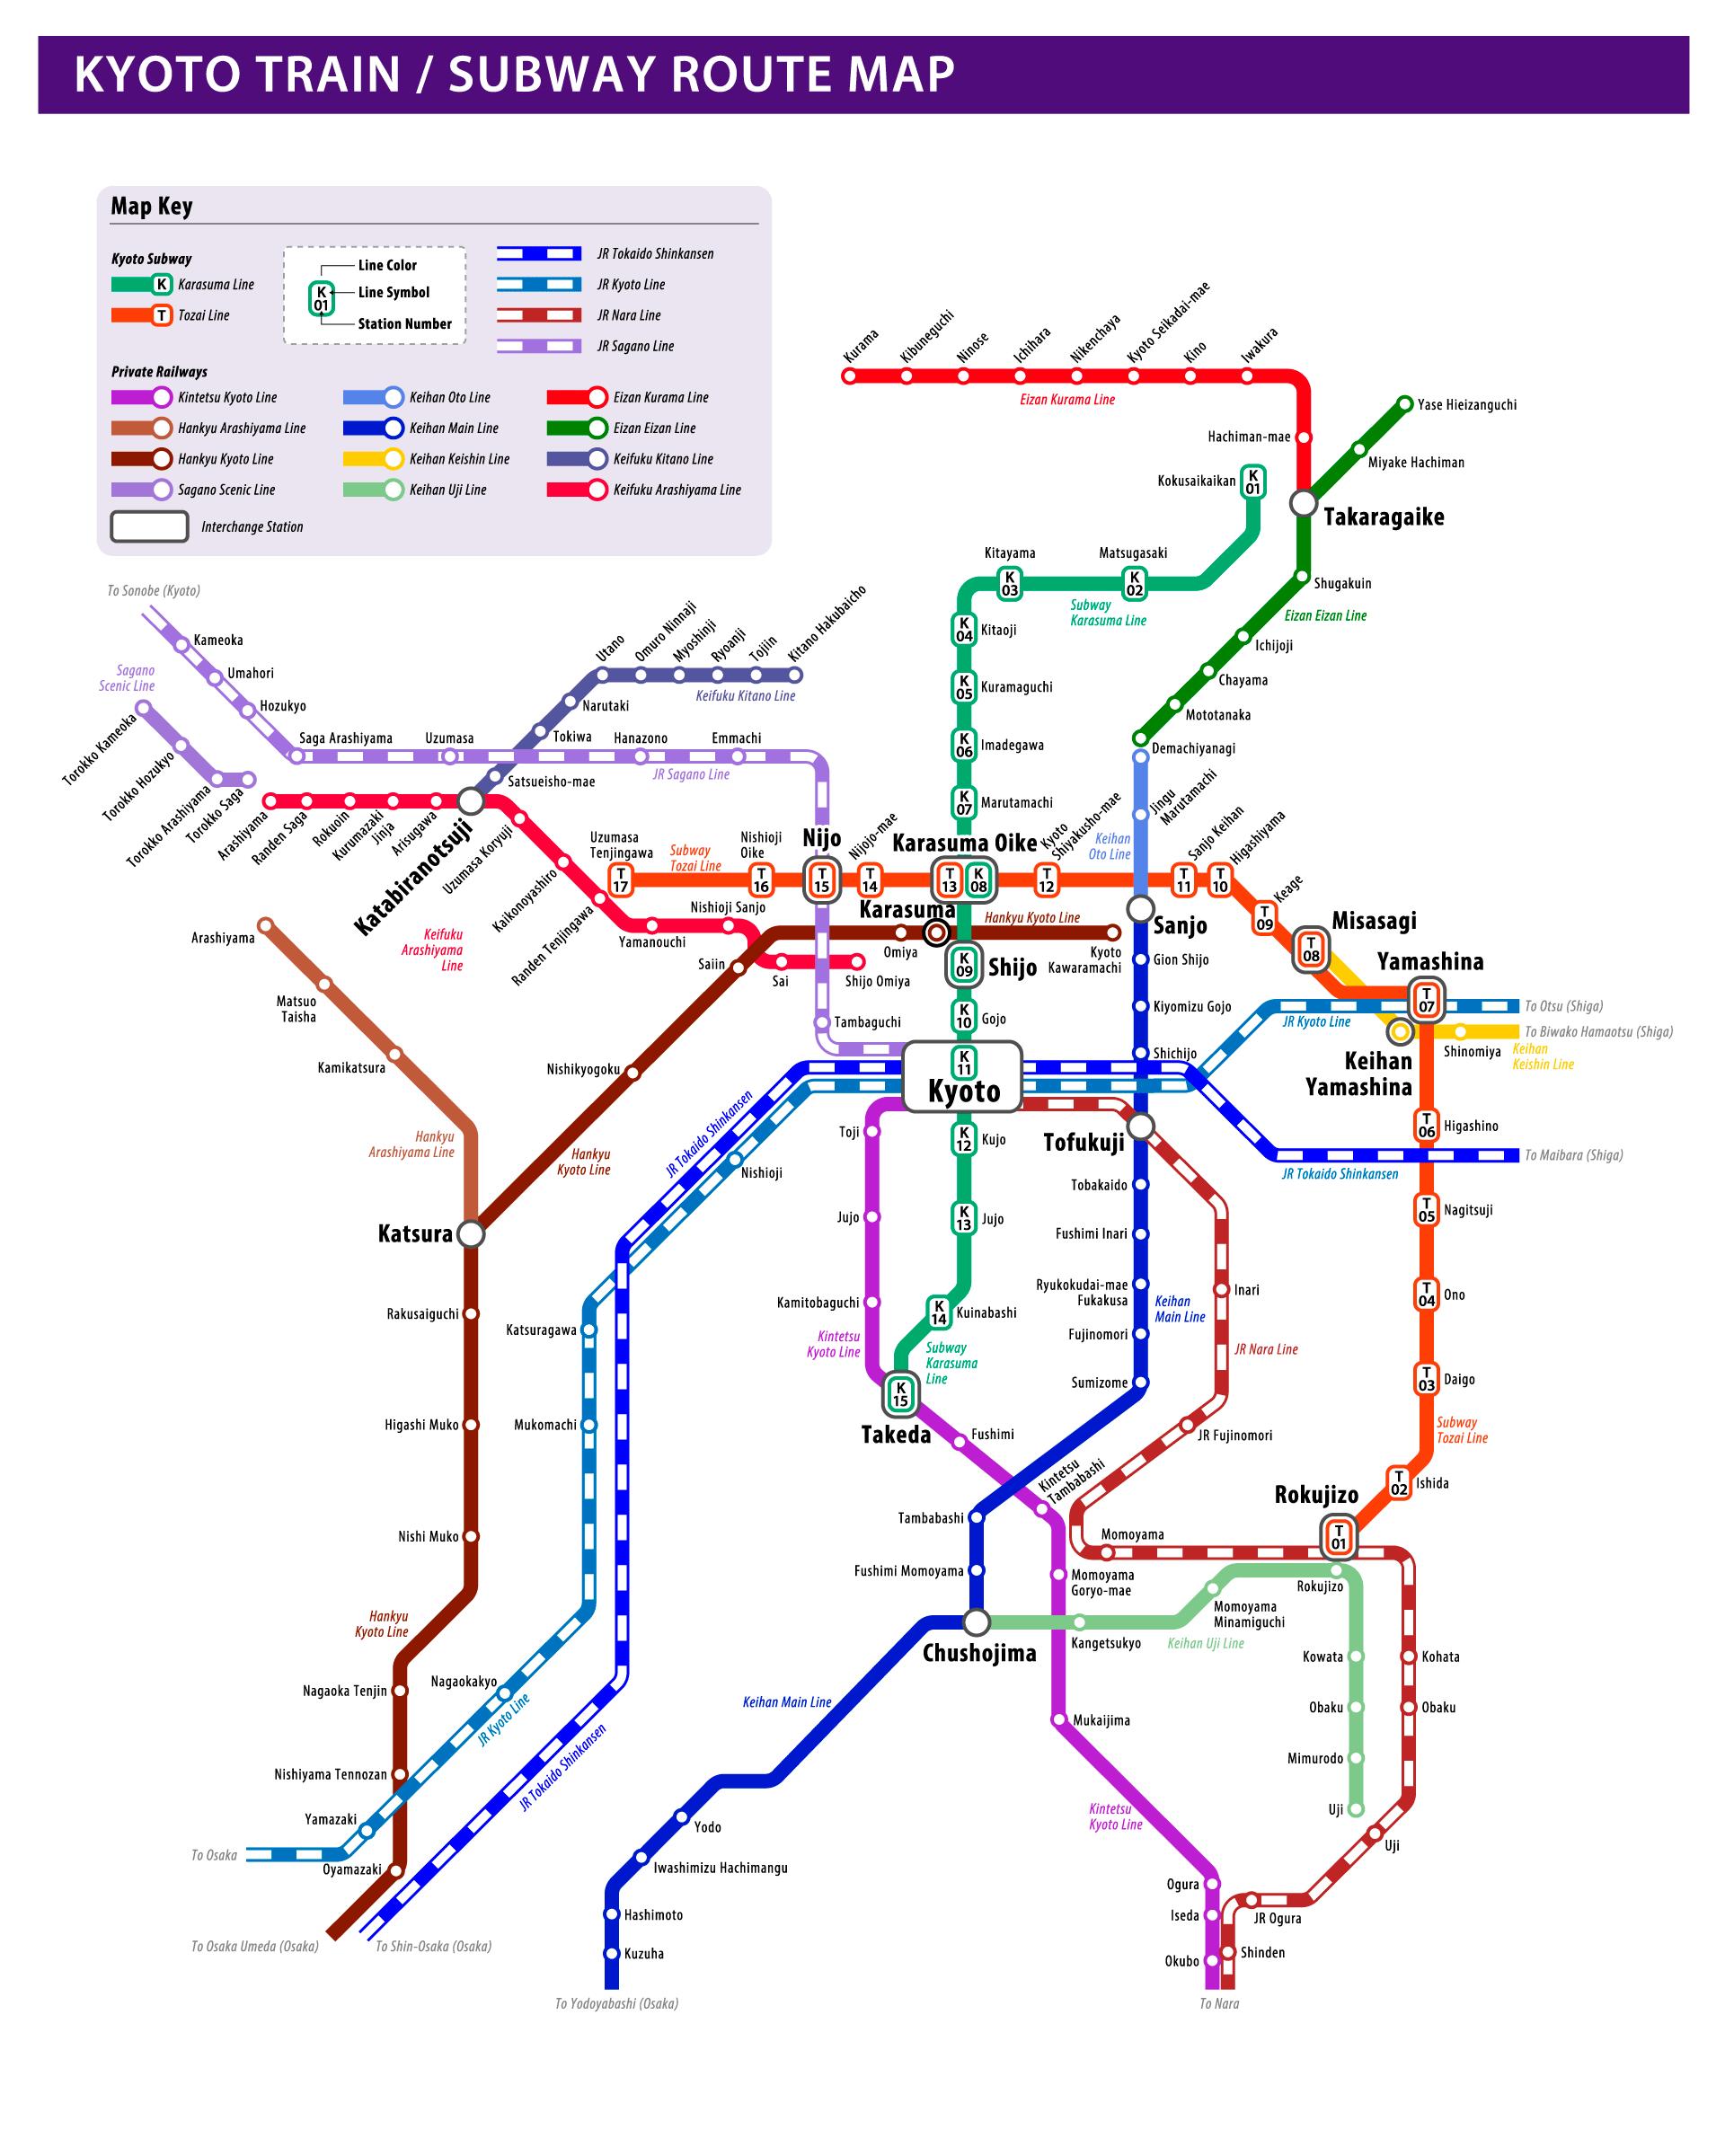 Kyoto Train / Subway Route Map